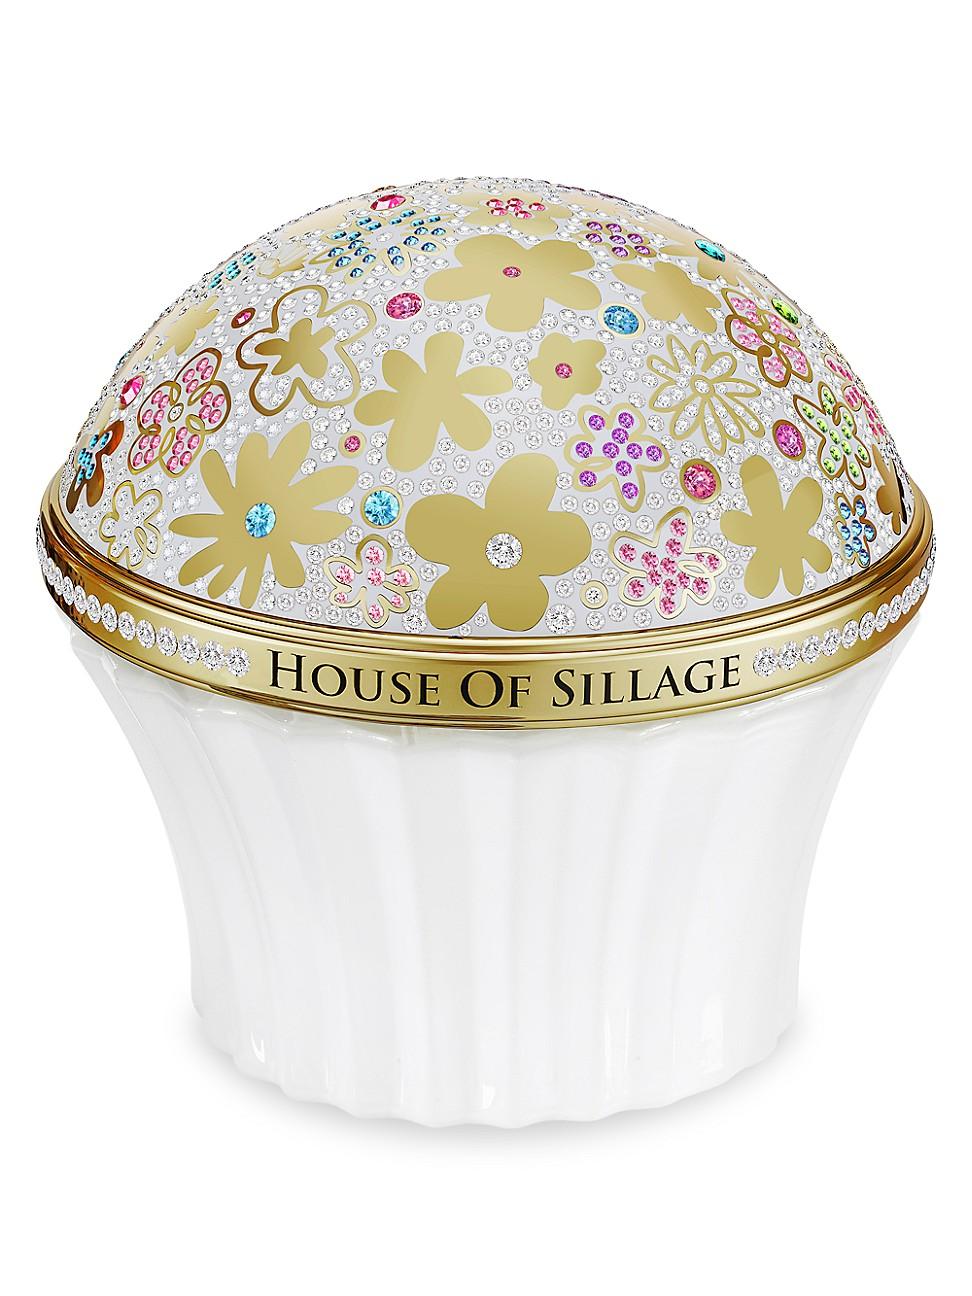 House Of Sillage WOMEN'S WHISPERS OF TRUTH EAU DE PARFUM